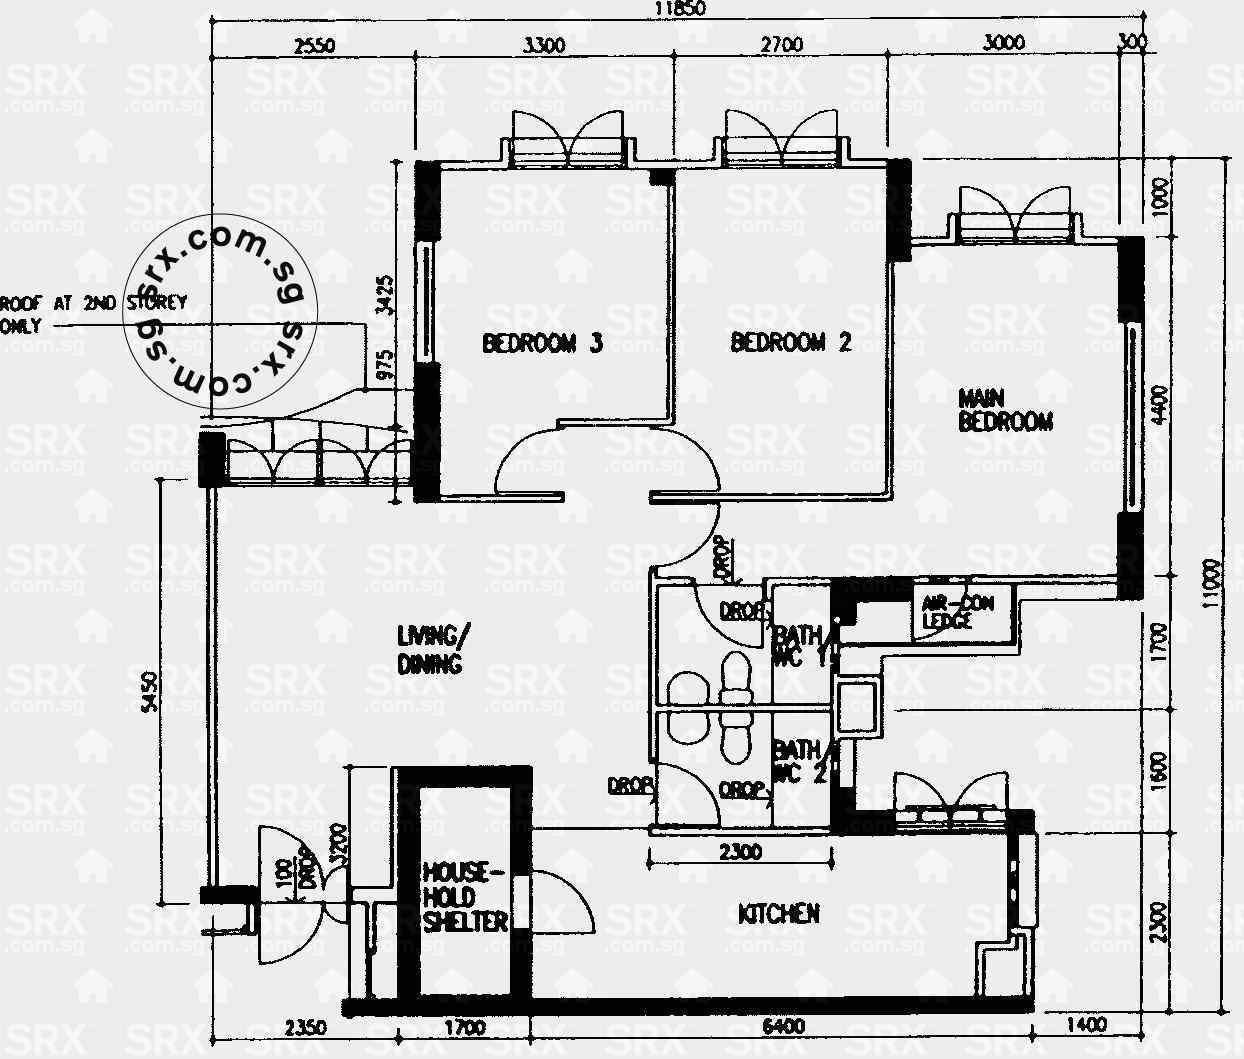 Floor plans for 49 jalan tiga s390049 hdb details srx property levellvl 11 ccuart Images